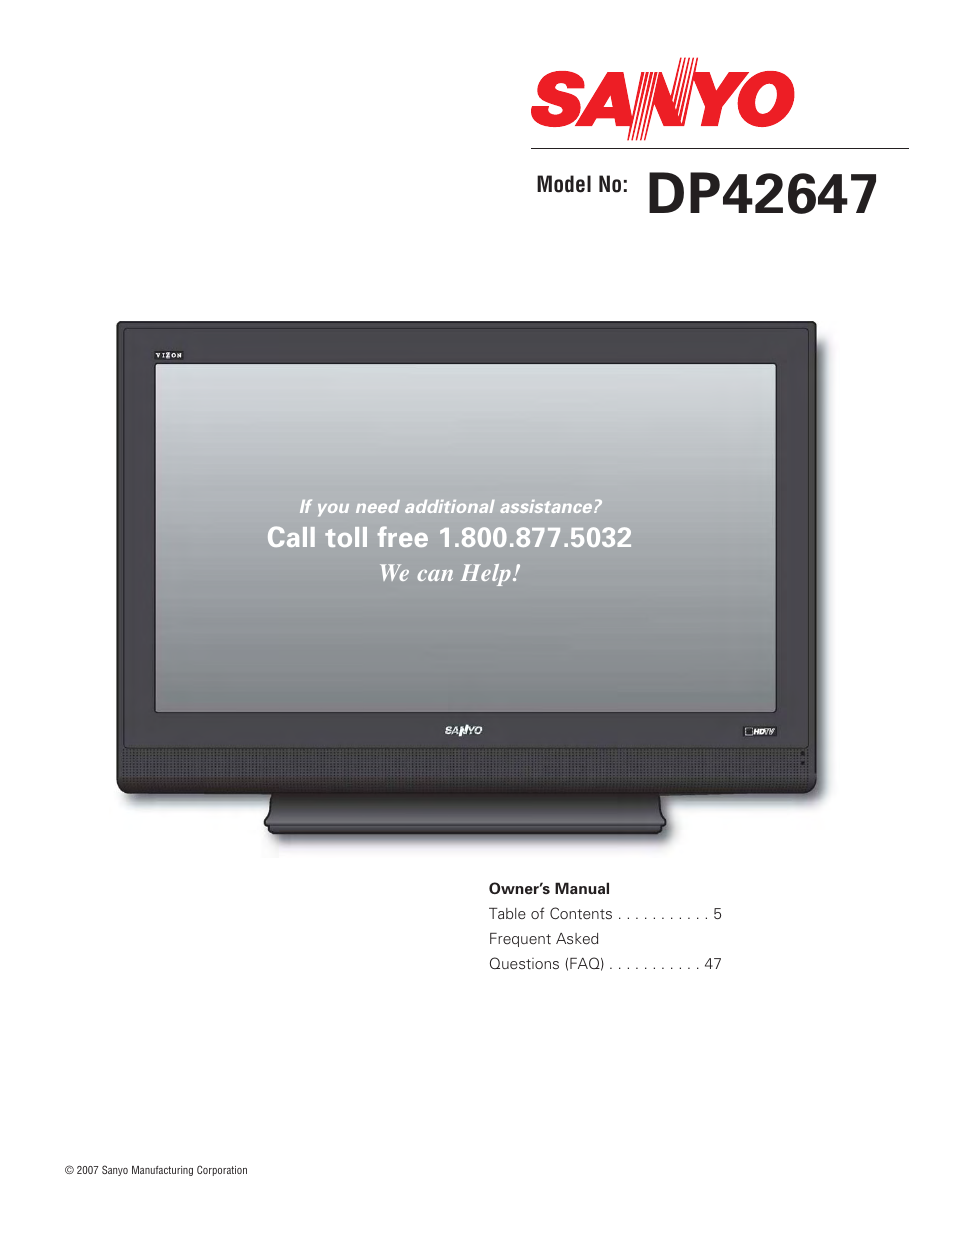 sanyo dp42647 user manual 48 pages rh manualsdir com sanyo vizon clt1554 manual sanyo vizon tv manual